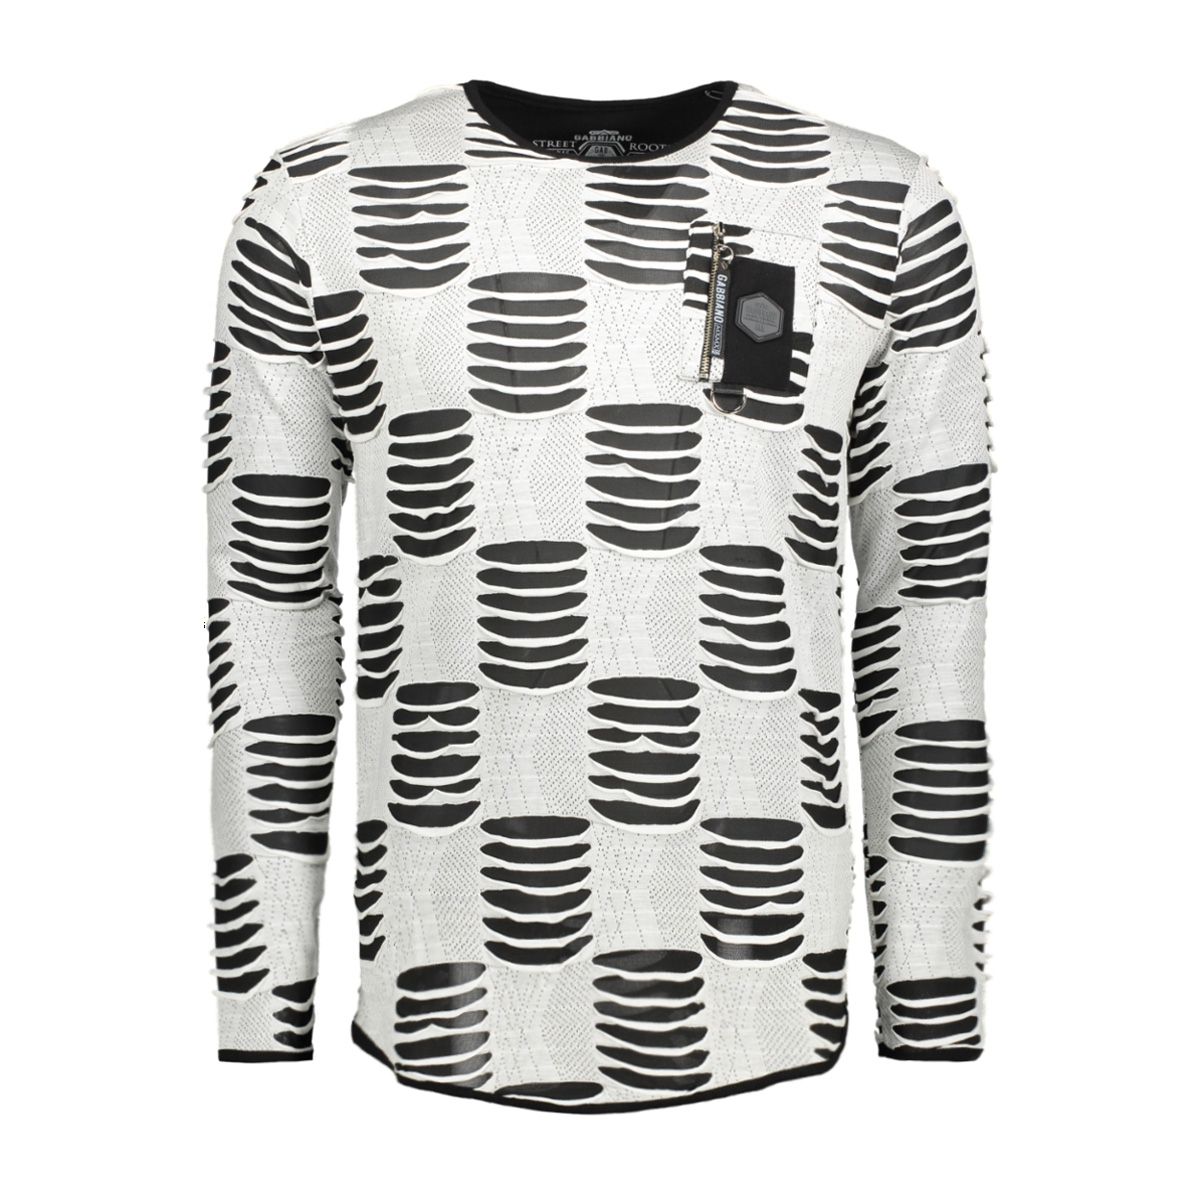 13853 gabbiano t-shirt wit